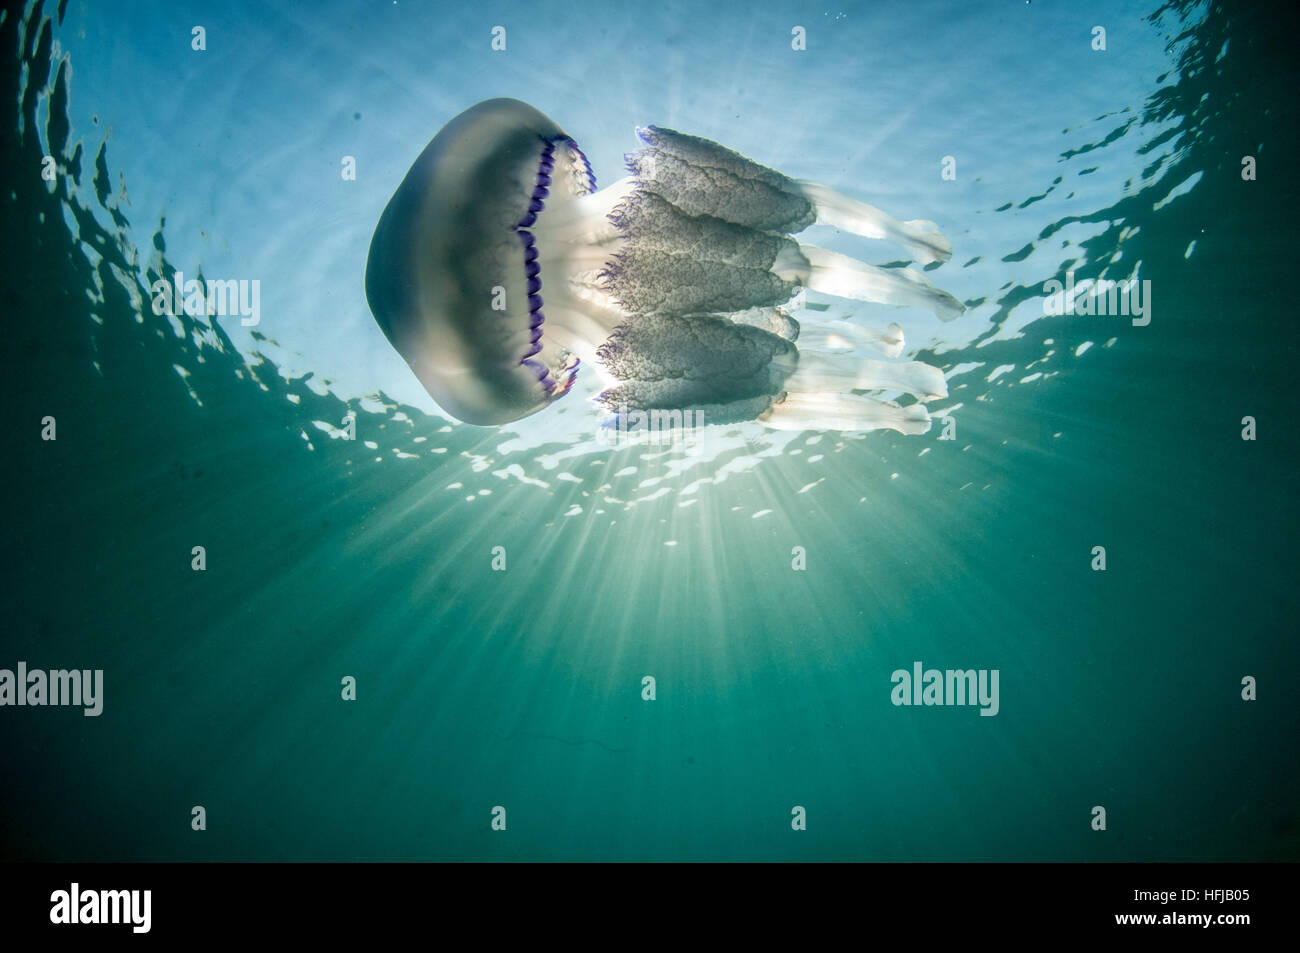 Rhizostoma pulmo, méduses, en mer Méditerranée, Comarruga, Costa Daurada, Espagne Photo Stock